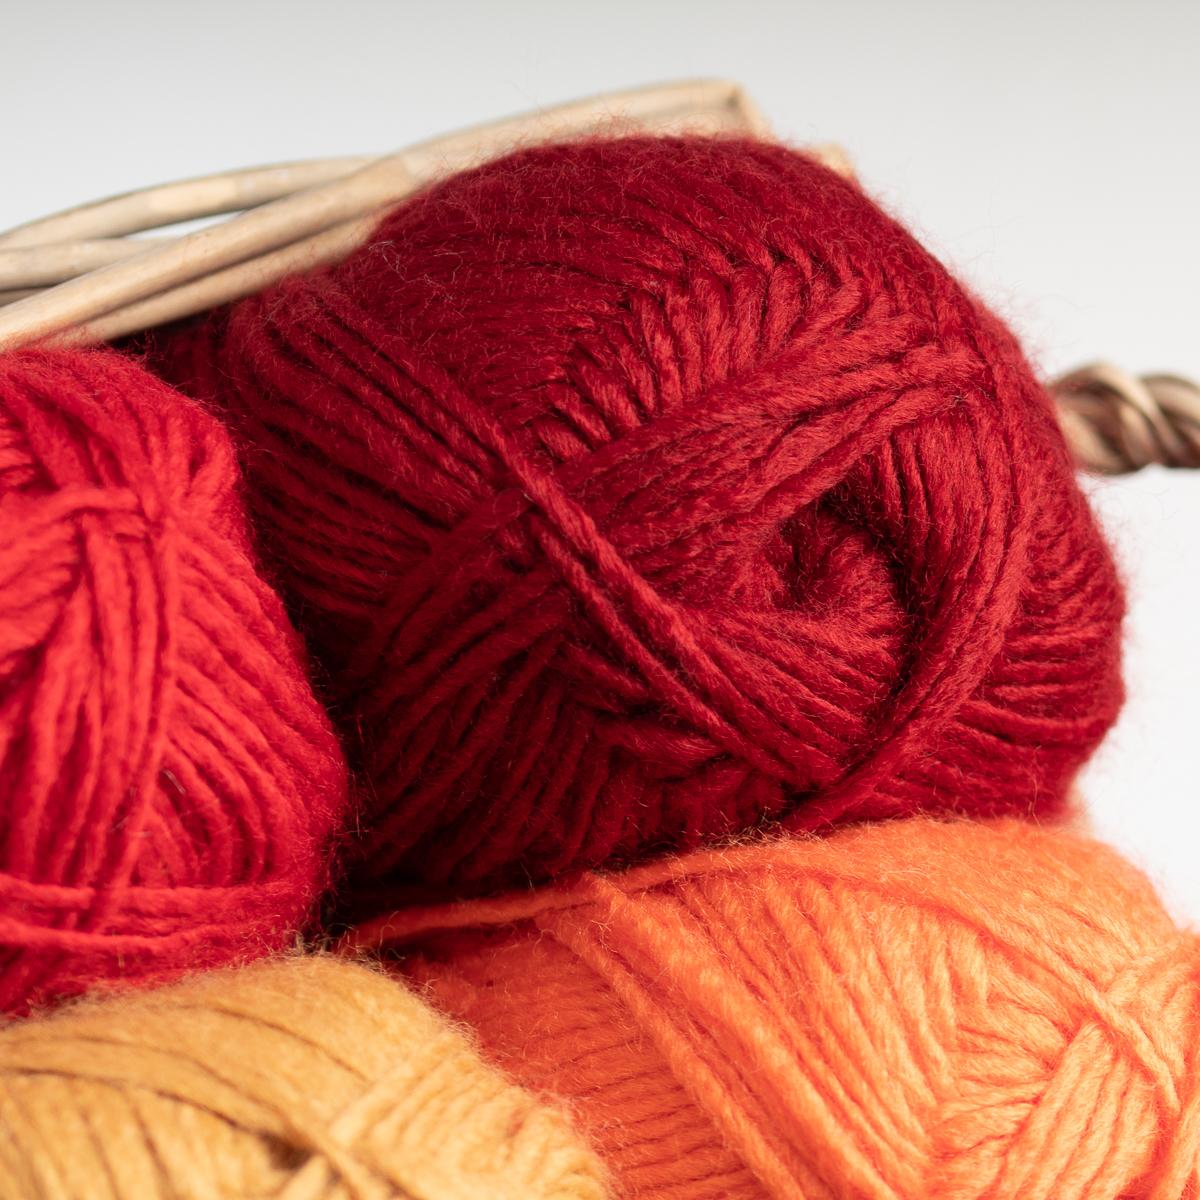 3pk-Lion-Brand-New-Basic-Acrylic-amp-Wool-Yarn-Medium-4-Knit-Crochet-Skeins-Soft thumbnail 18